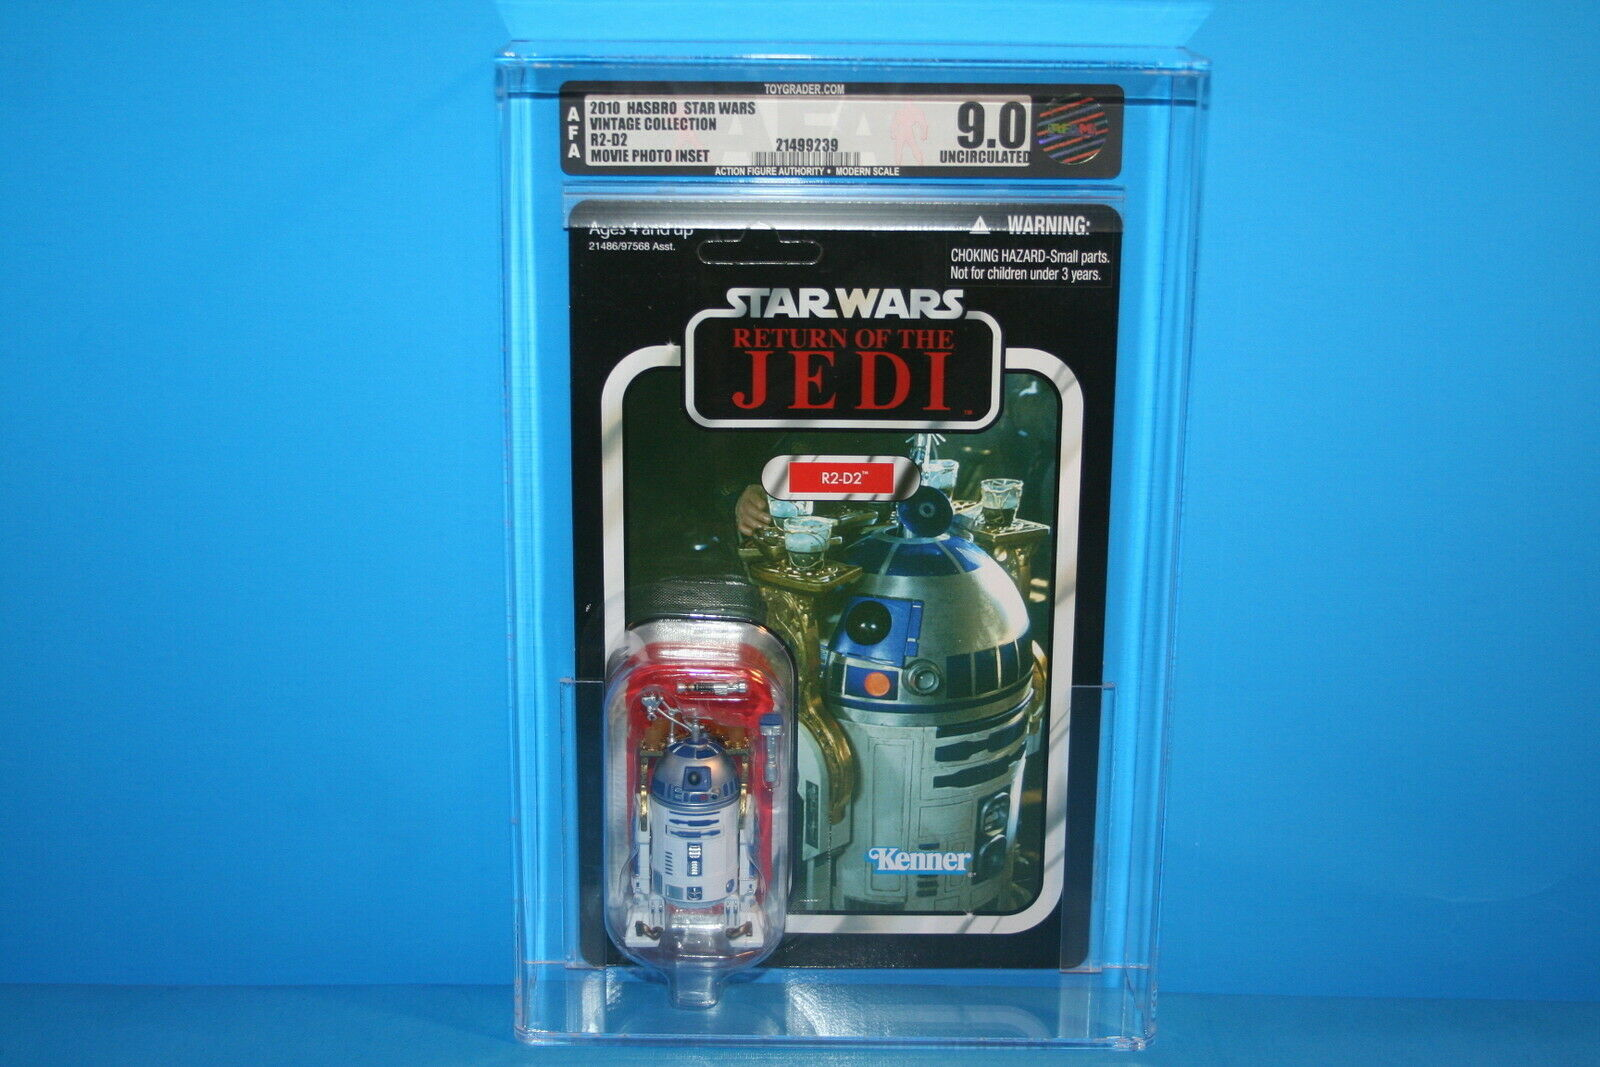 Figura De Estrella Wars autoridad Tvc menta en tarjeta graduada 2010 figura R2-D2 Regreso del Jedi   25 HASBRO  u  9.0